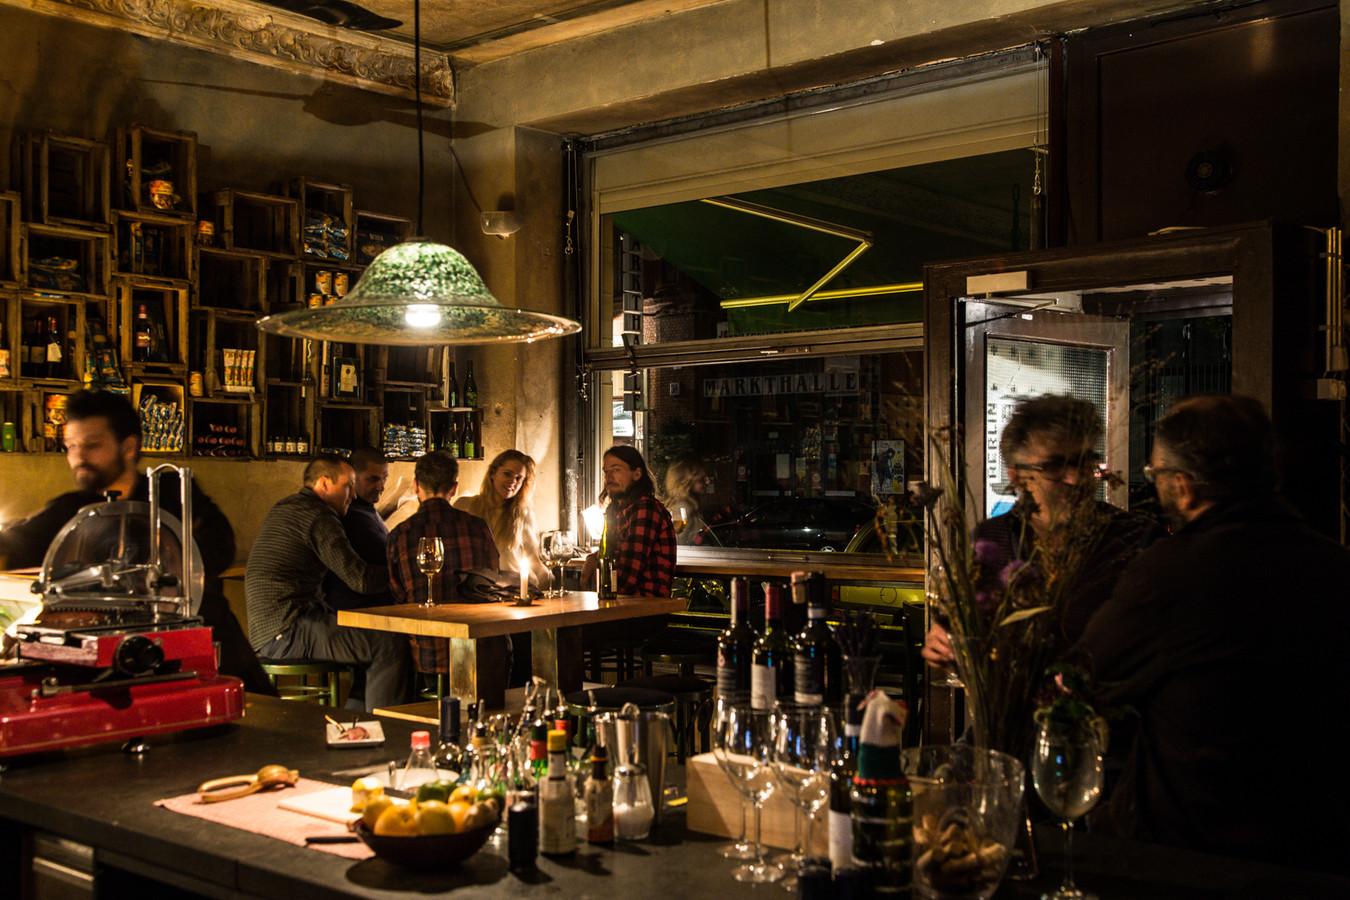 gallina ihre vineria bar in berlin. Black Bedroom Furniture Sets. Home Design Ideas